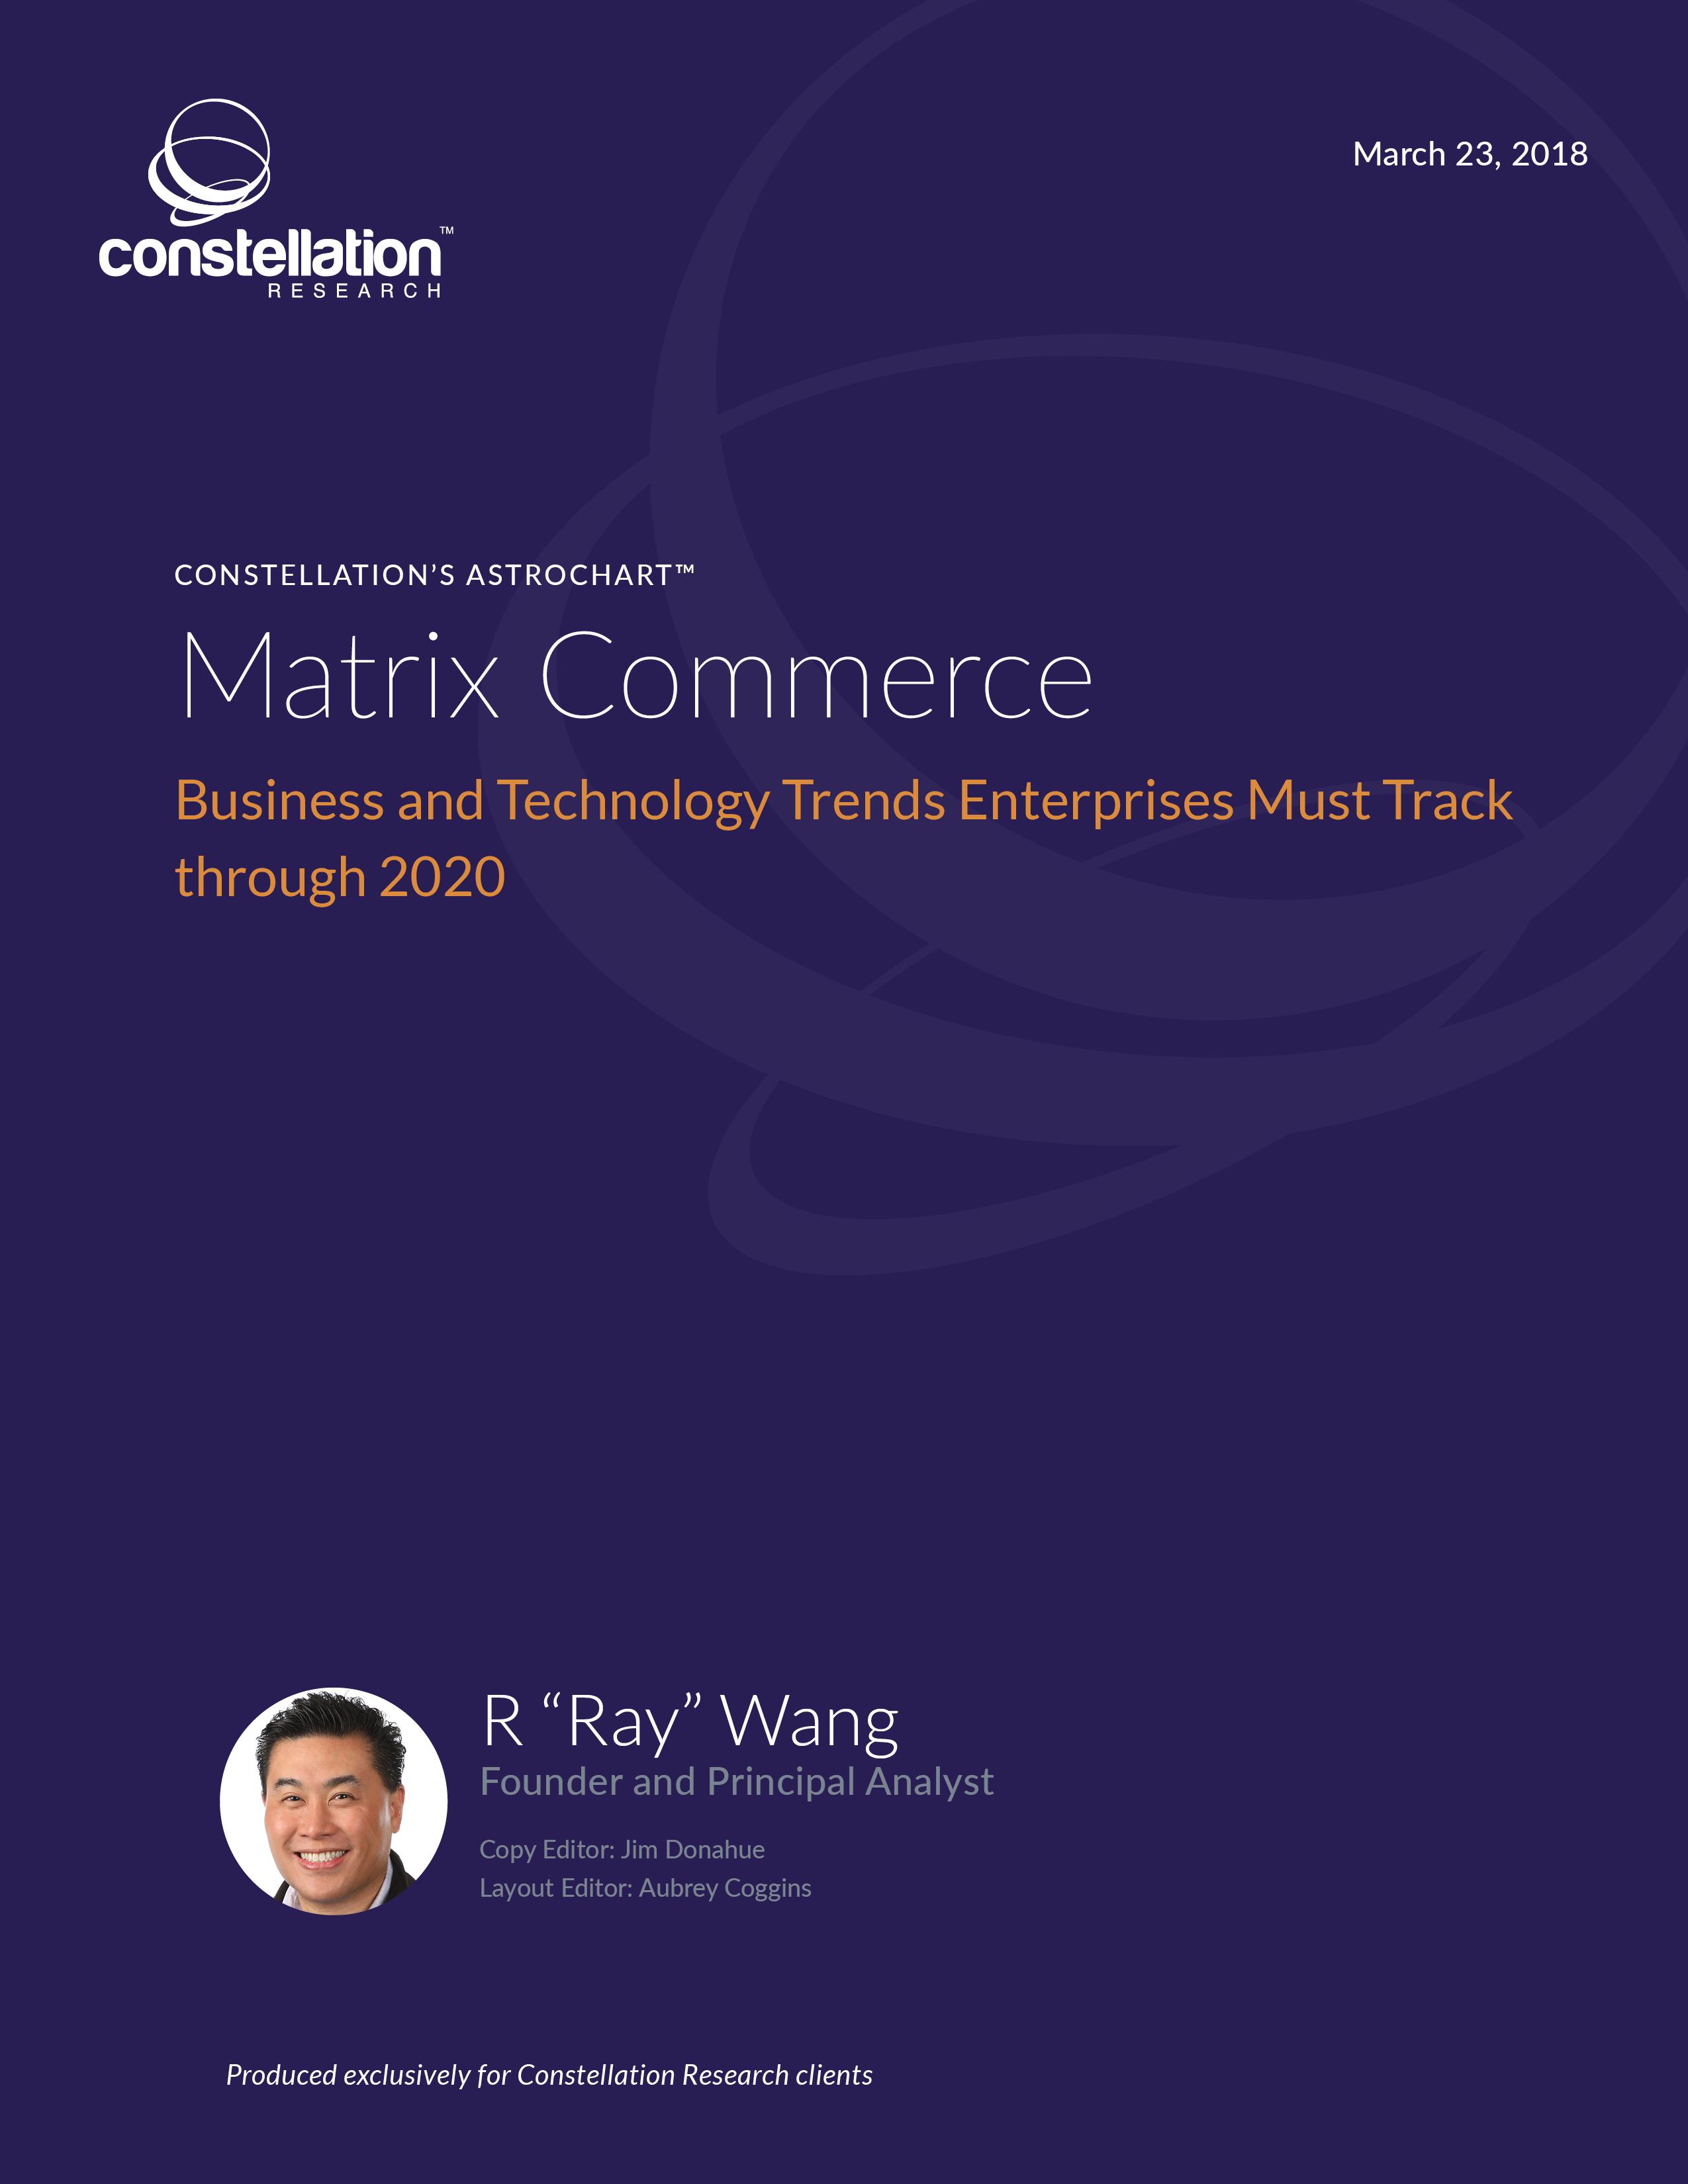 Constellation Astrochart for Matrix Commerce